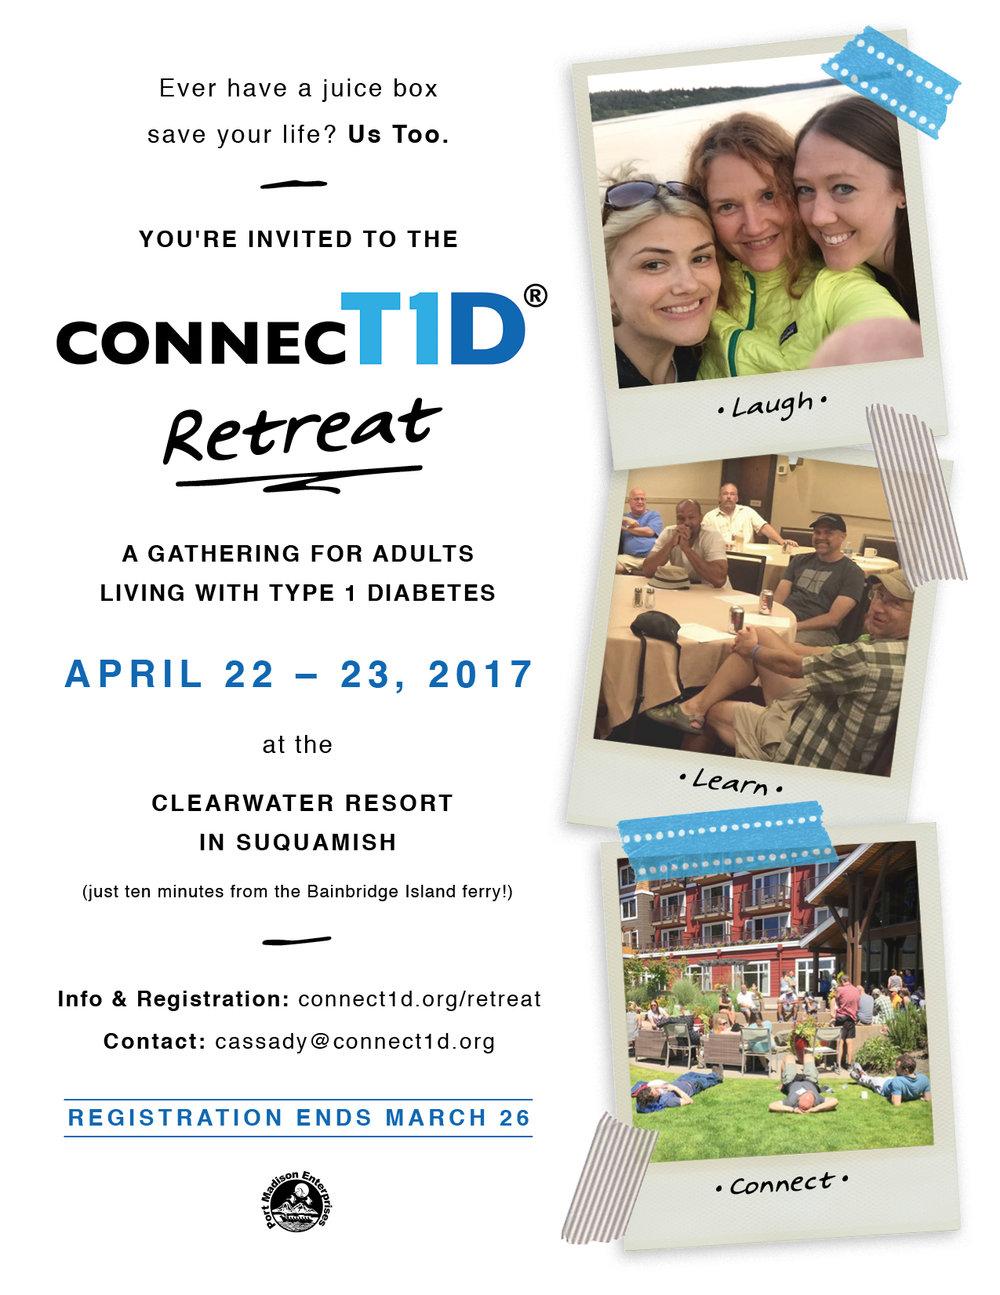 CT1D Retreat 3/26